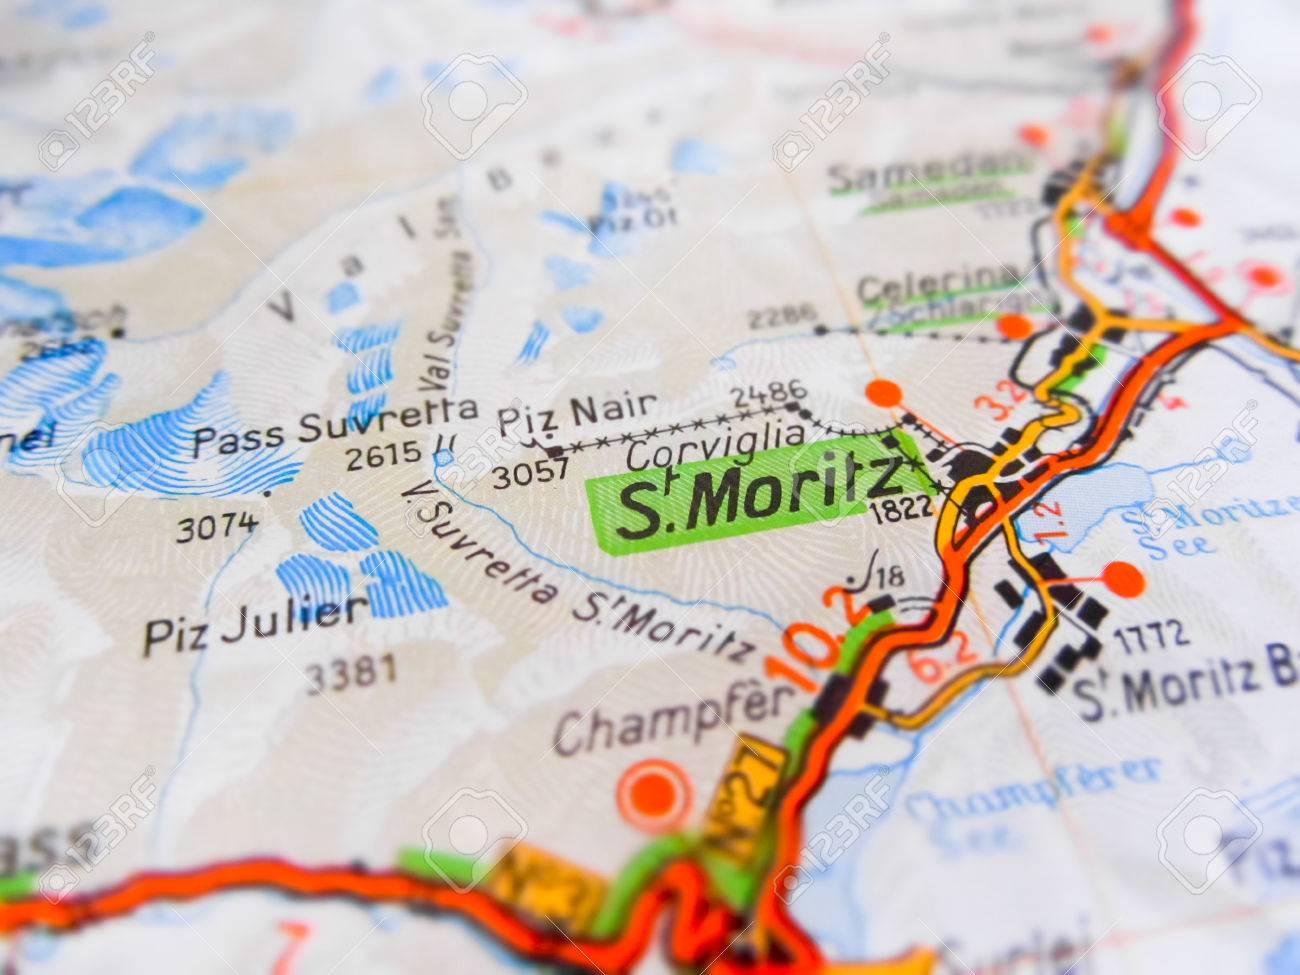 Svizzera Cartina Stradale.Immagini Stock St Moritz Citta Su Una Cartina Stradale Swiss Image 67703761